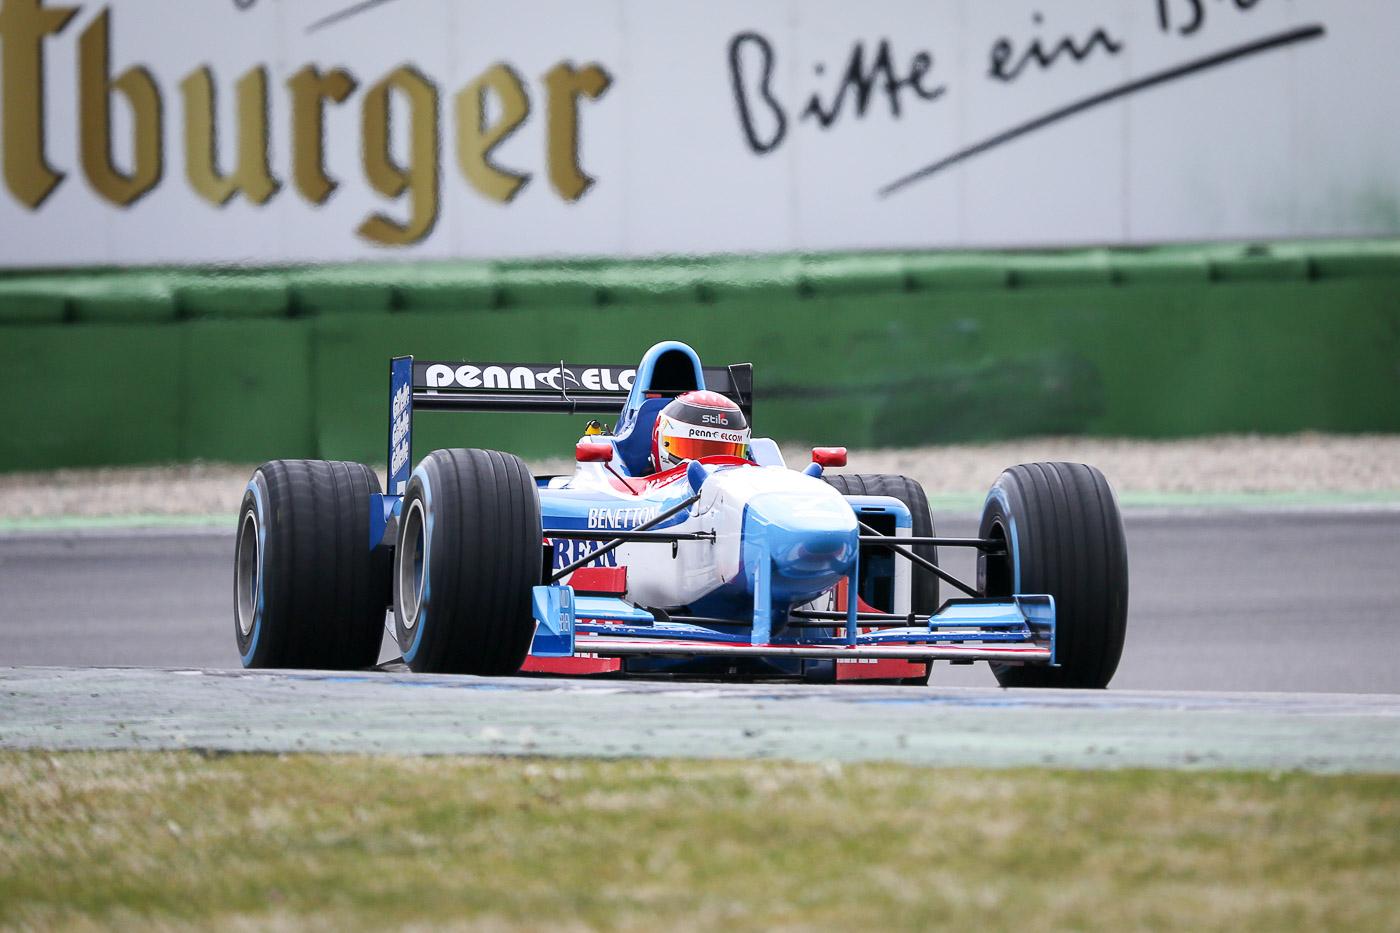 Benetton B197 - F1